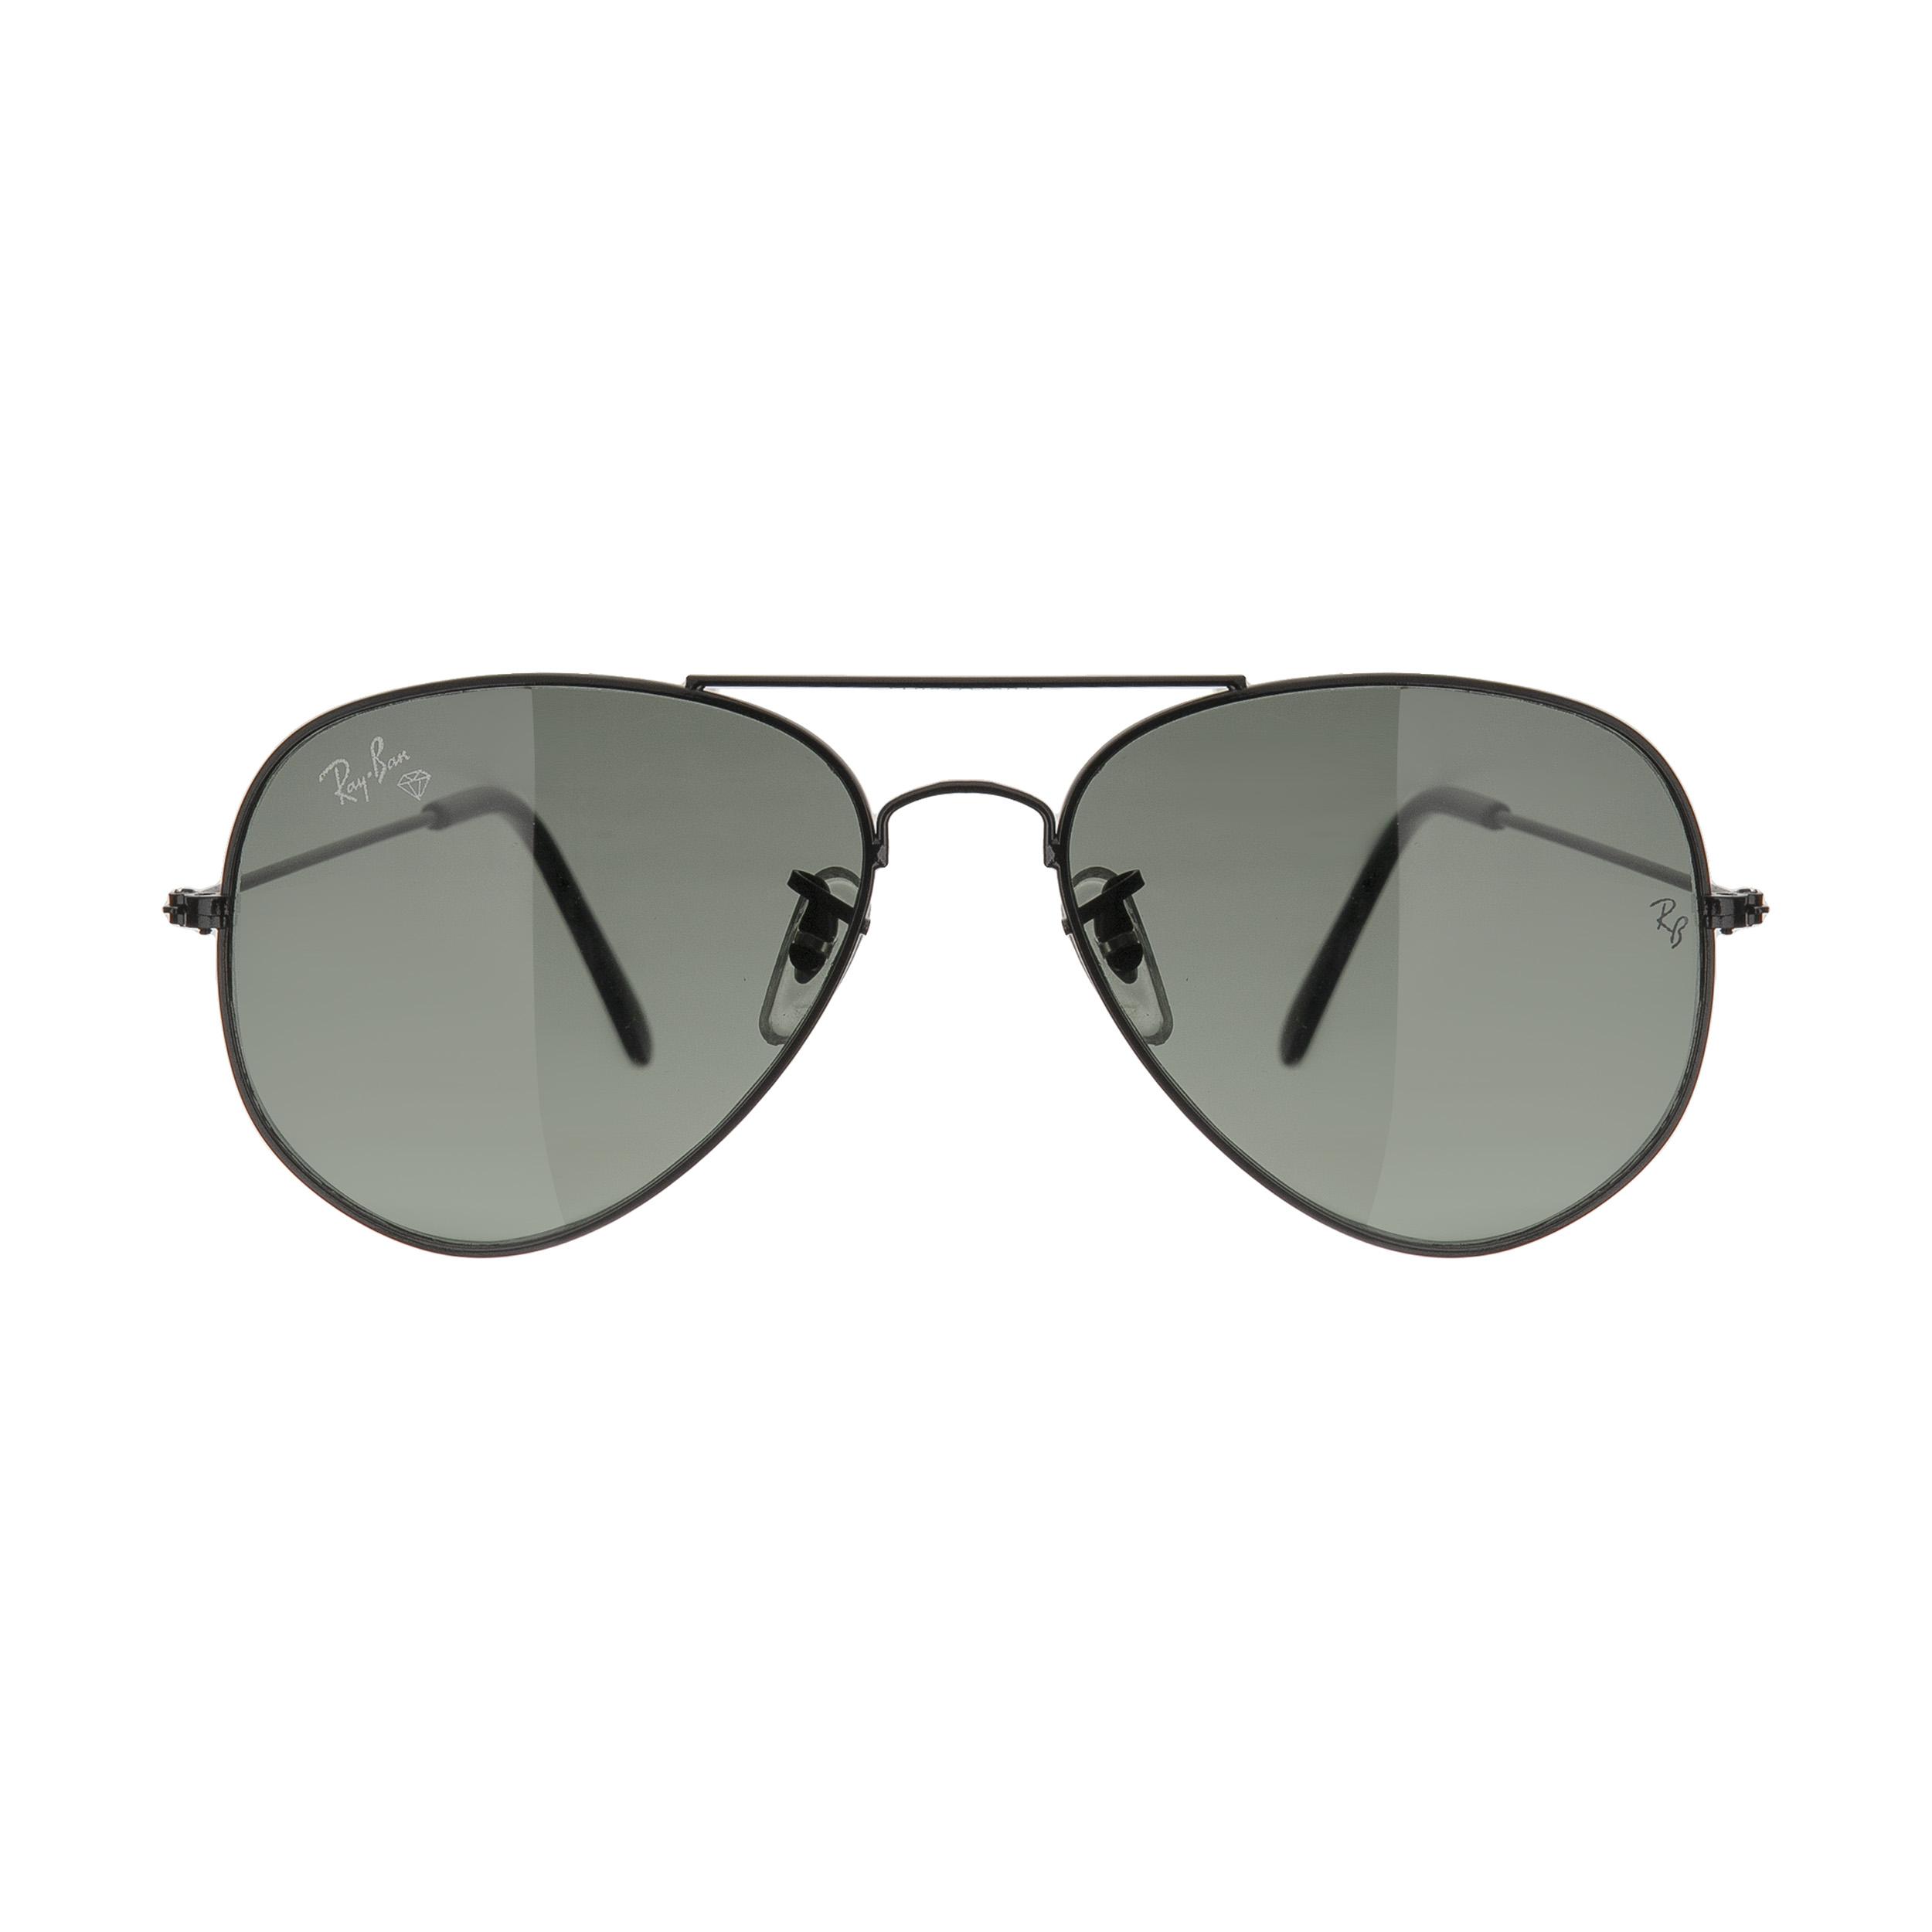 عینک آفتابی  کد 2234                     غیر اصل